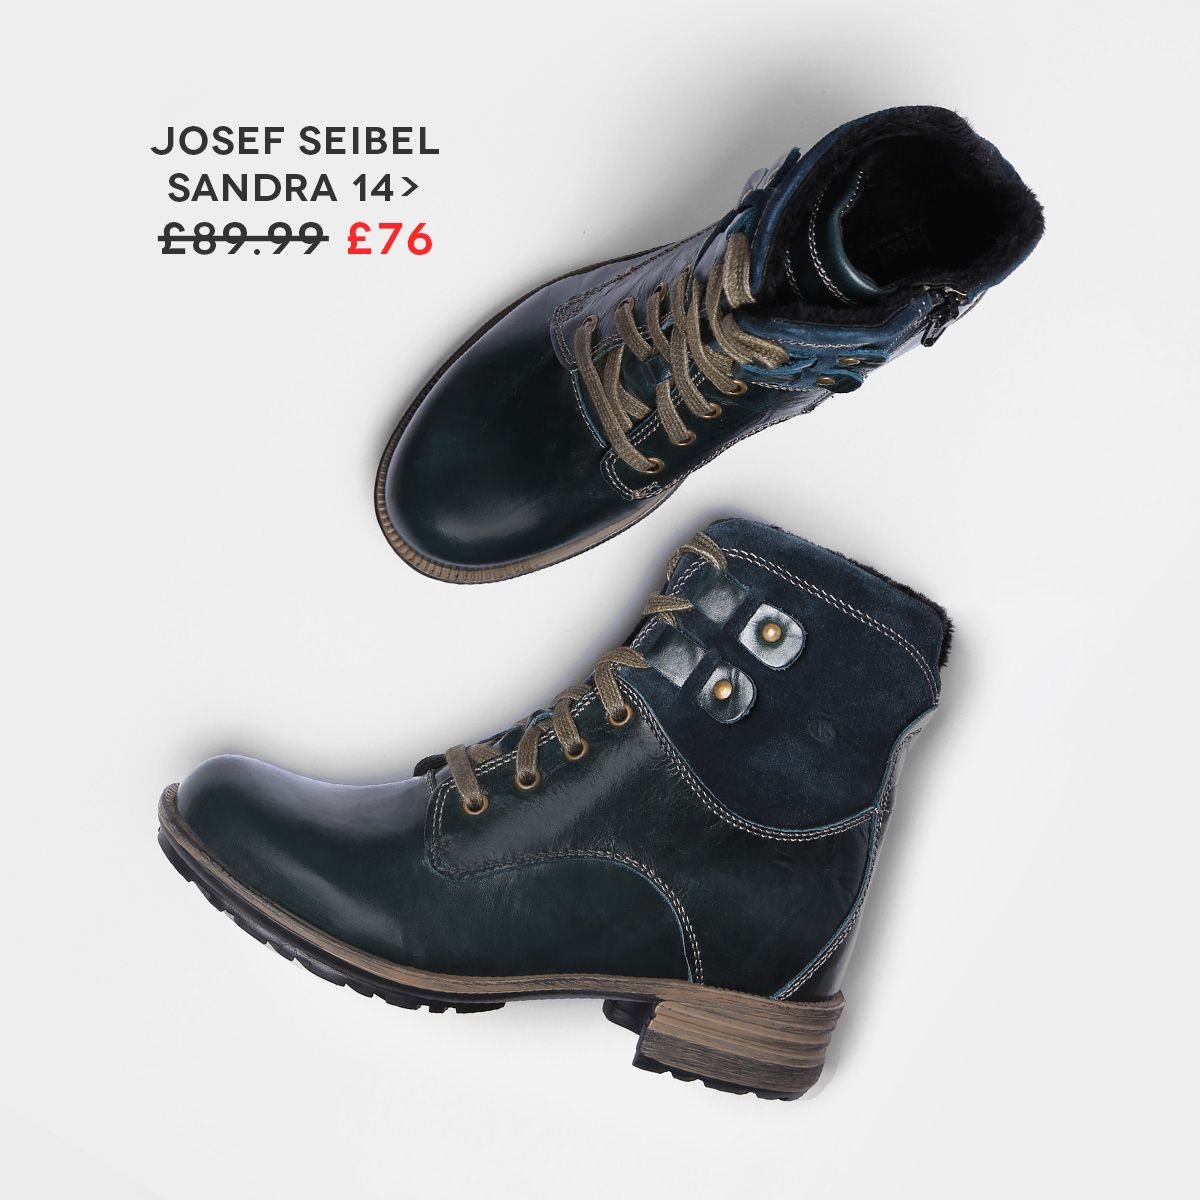 Sale top pick: Josef Seibel Sandra 14